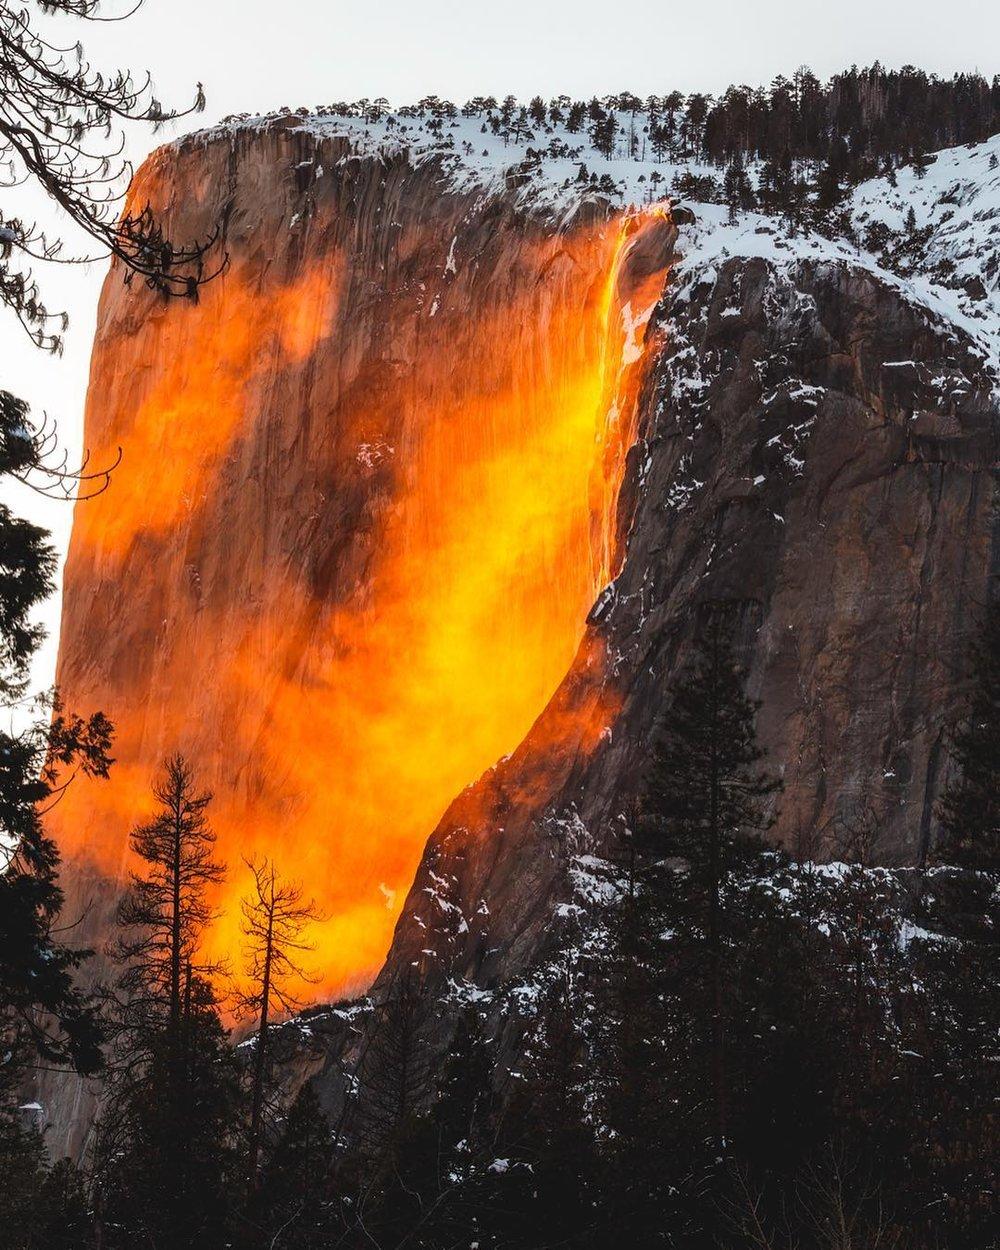 Yosemite Firefall National Park Horsetail Fall Winter February